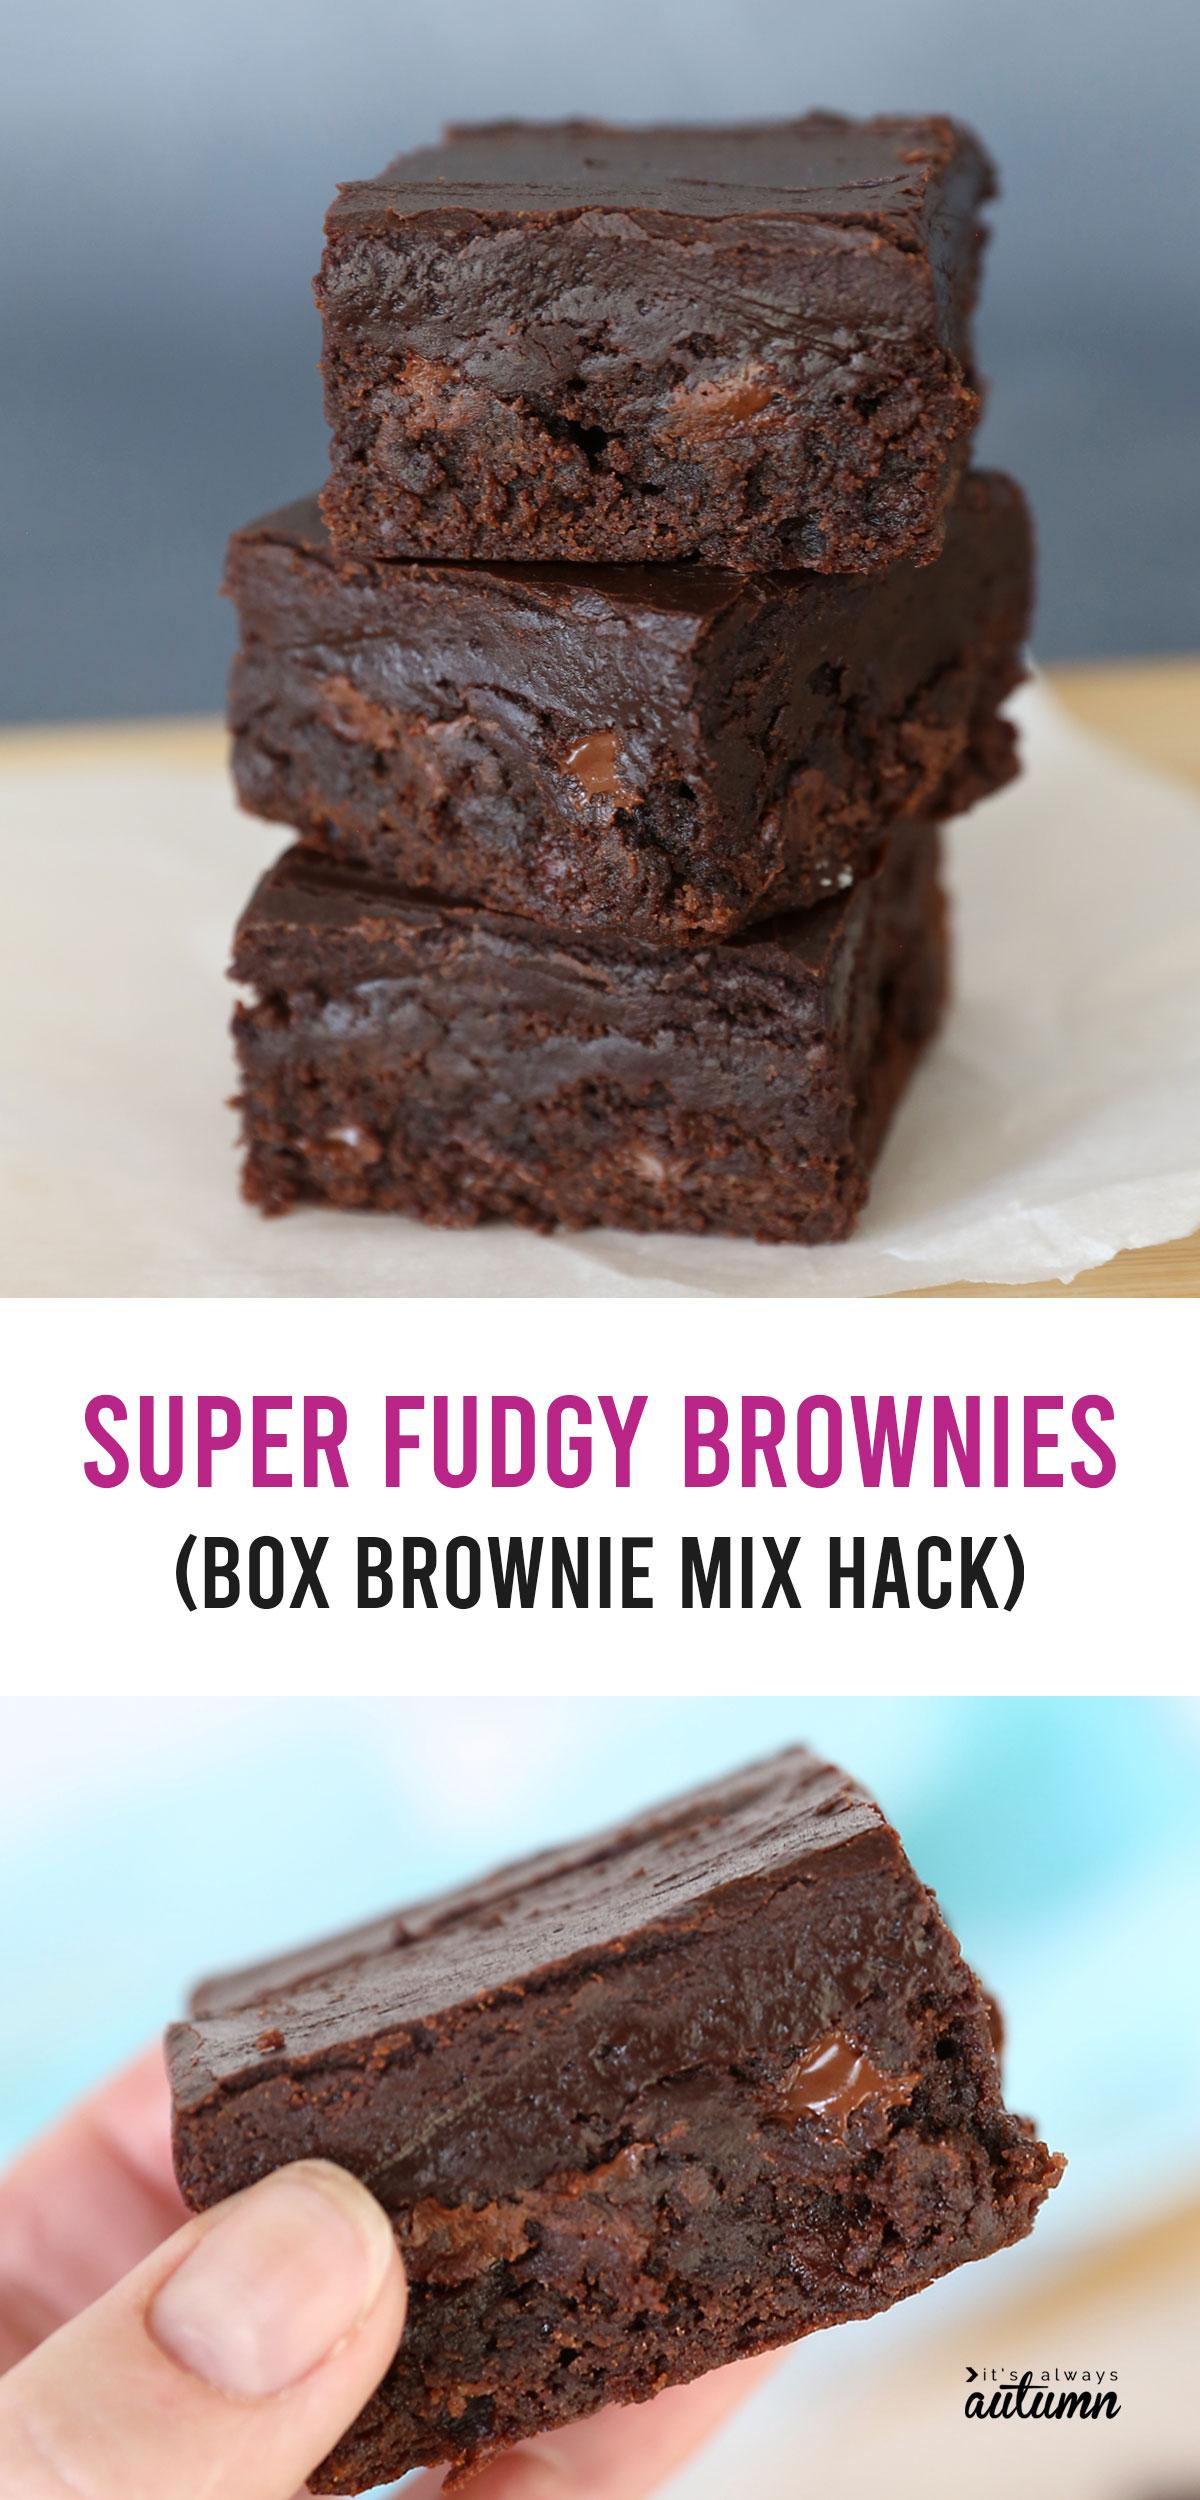 Stack of fudgy brownies; hand holding brownie; box brownie mix hack